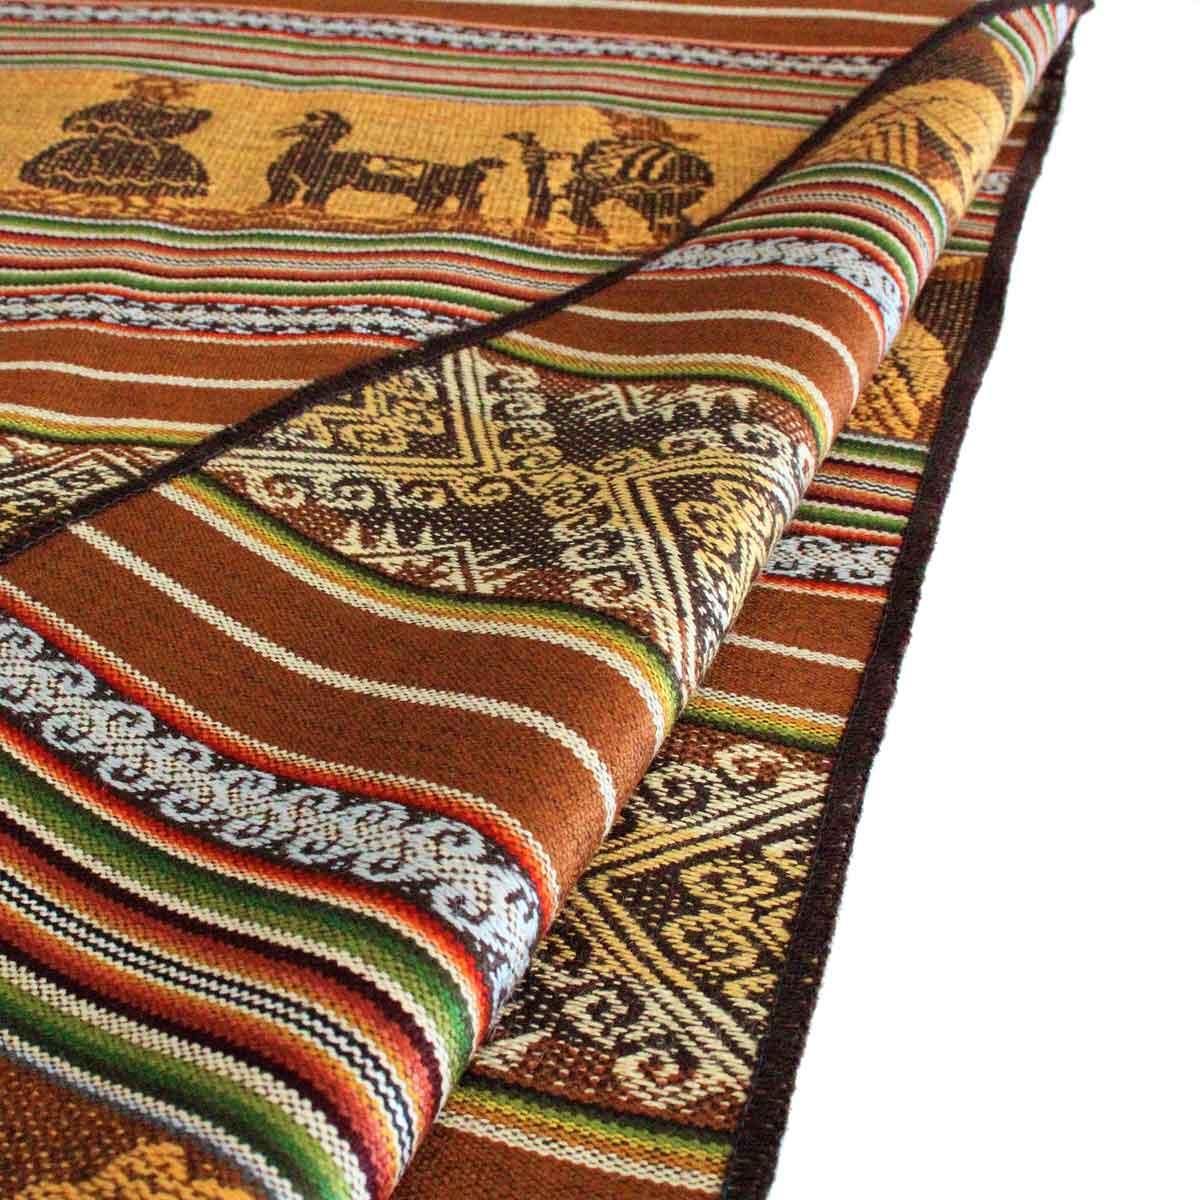 Inka-Products-Chemin de Table Péruvien-Marron ALLIN RURAY-2